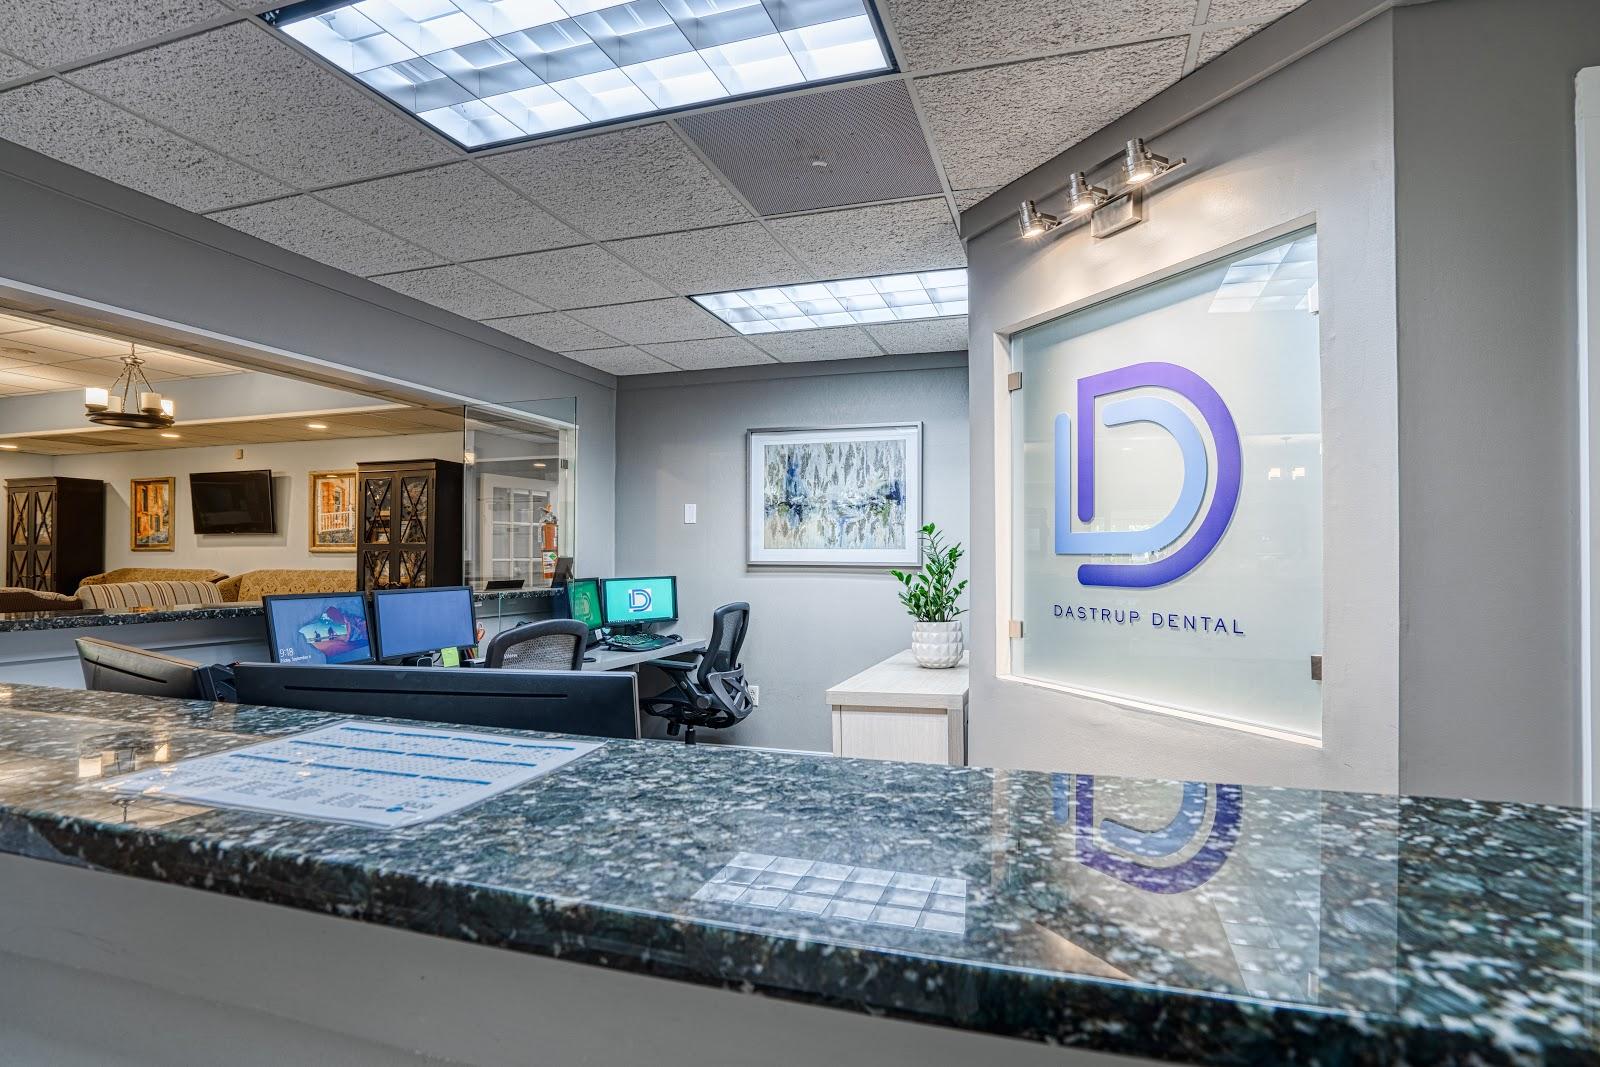 Dastrup dental, an affordable family dentist in Davidson, NC